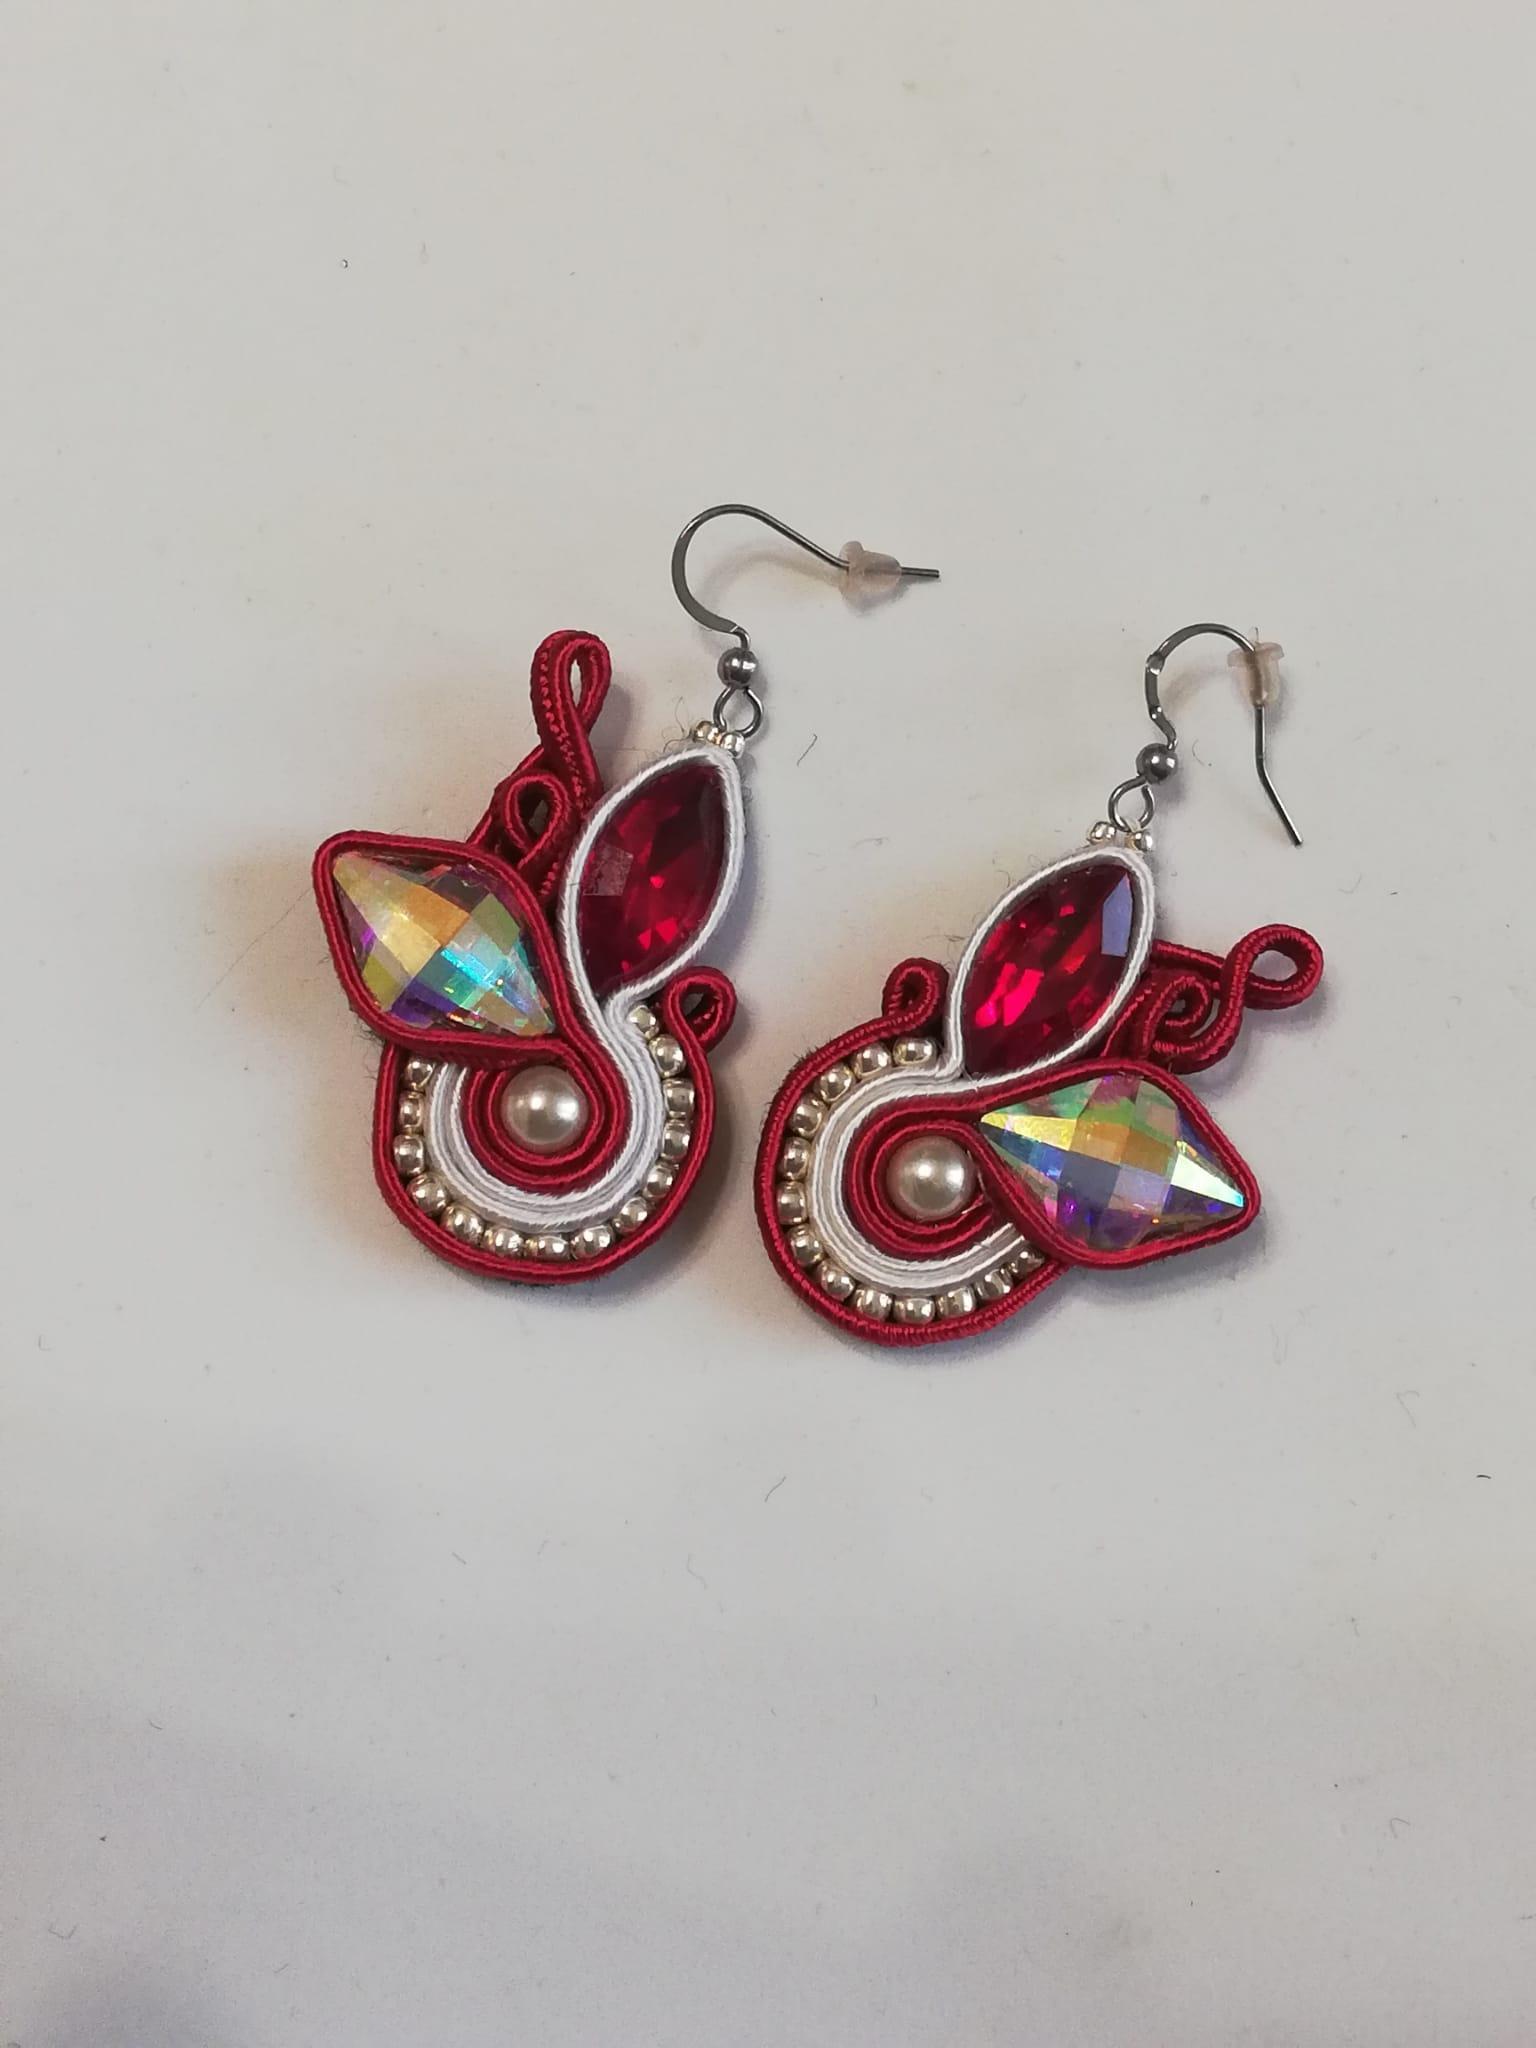 Soutache earrings. Handmade and hand-sewn jewellery